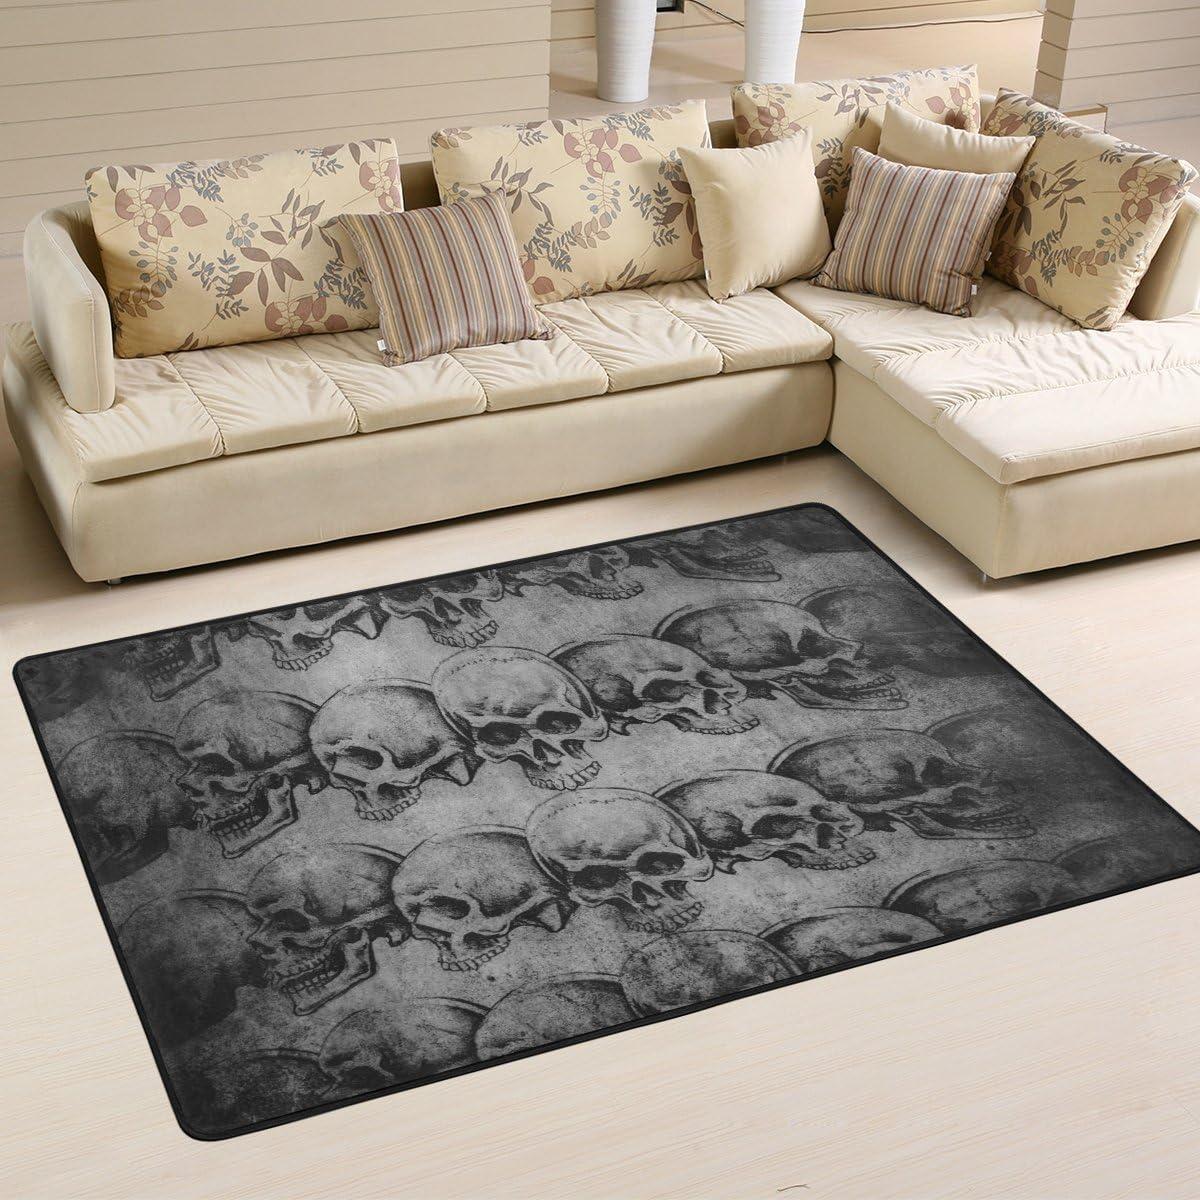 Naanle Sugar Skull Area Rug 2 x3 , Vintage Polyester Area Rug Mat for Living Dining Dorm Room Bedroom Home Decorative